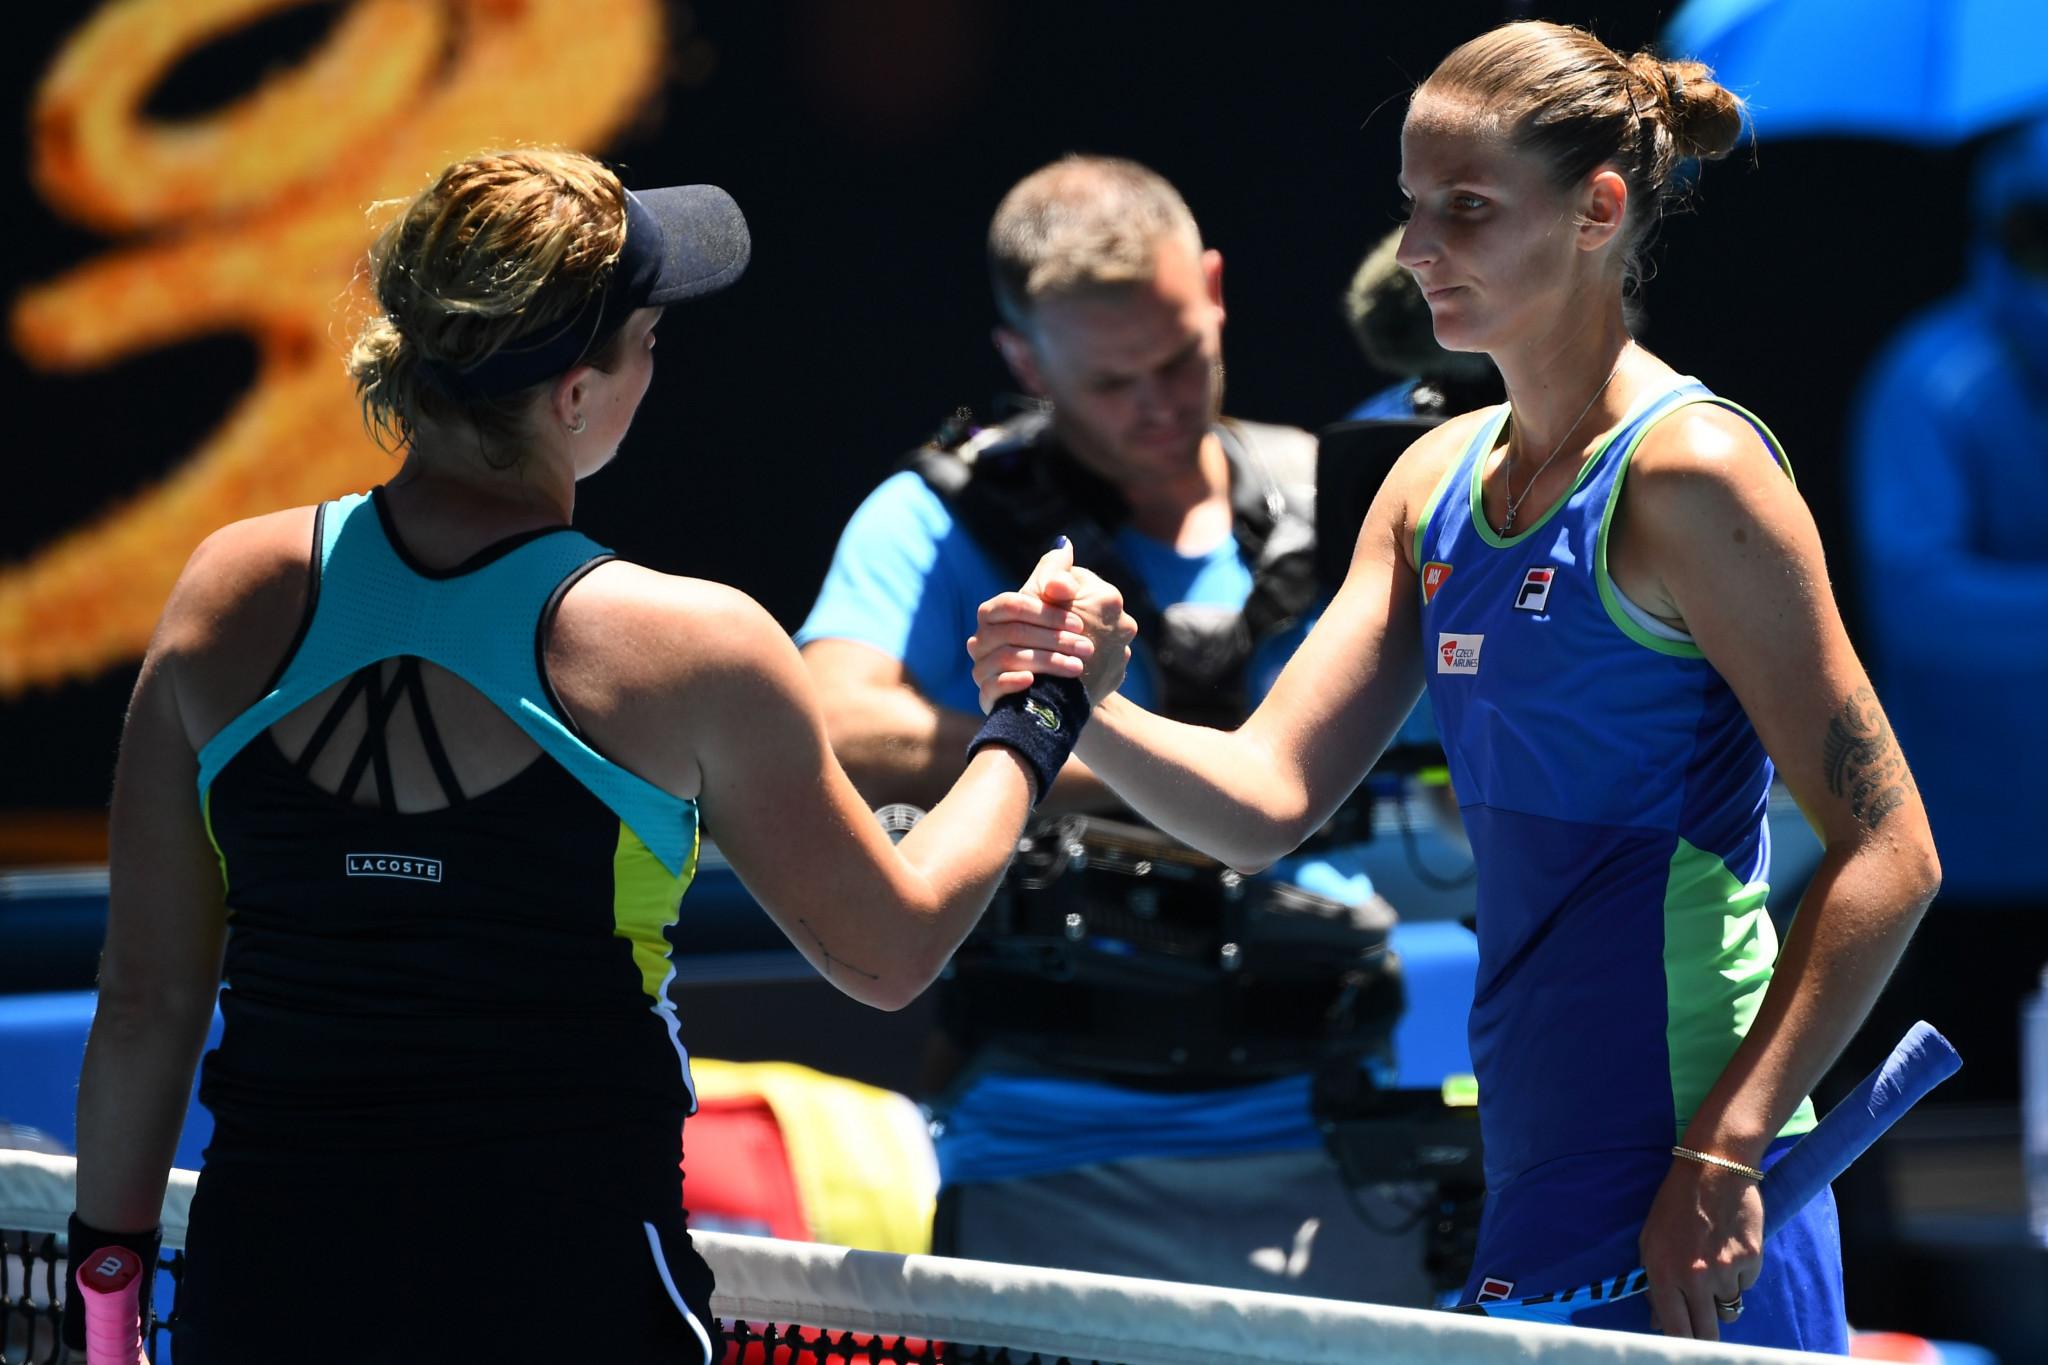 She was beaten by Anastasia Pavlyuchenkova of Russia 7-6, 7-6 ©Getty Images